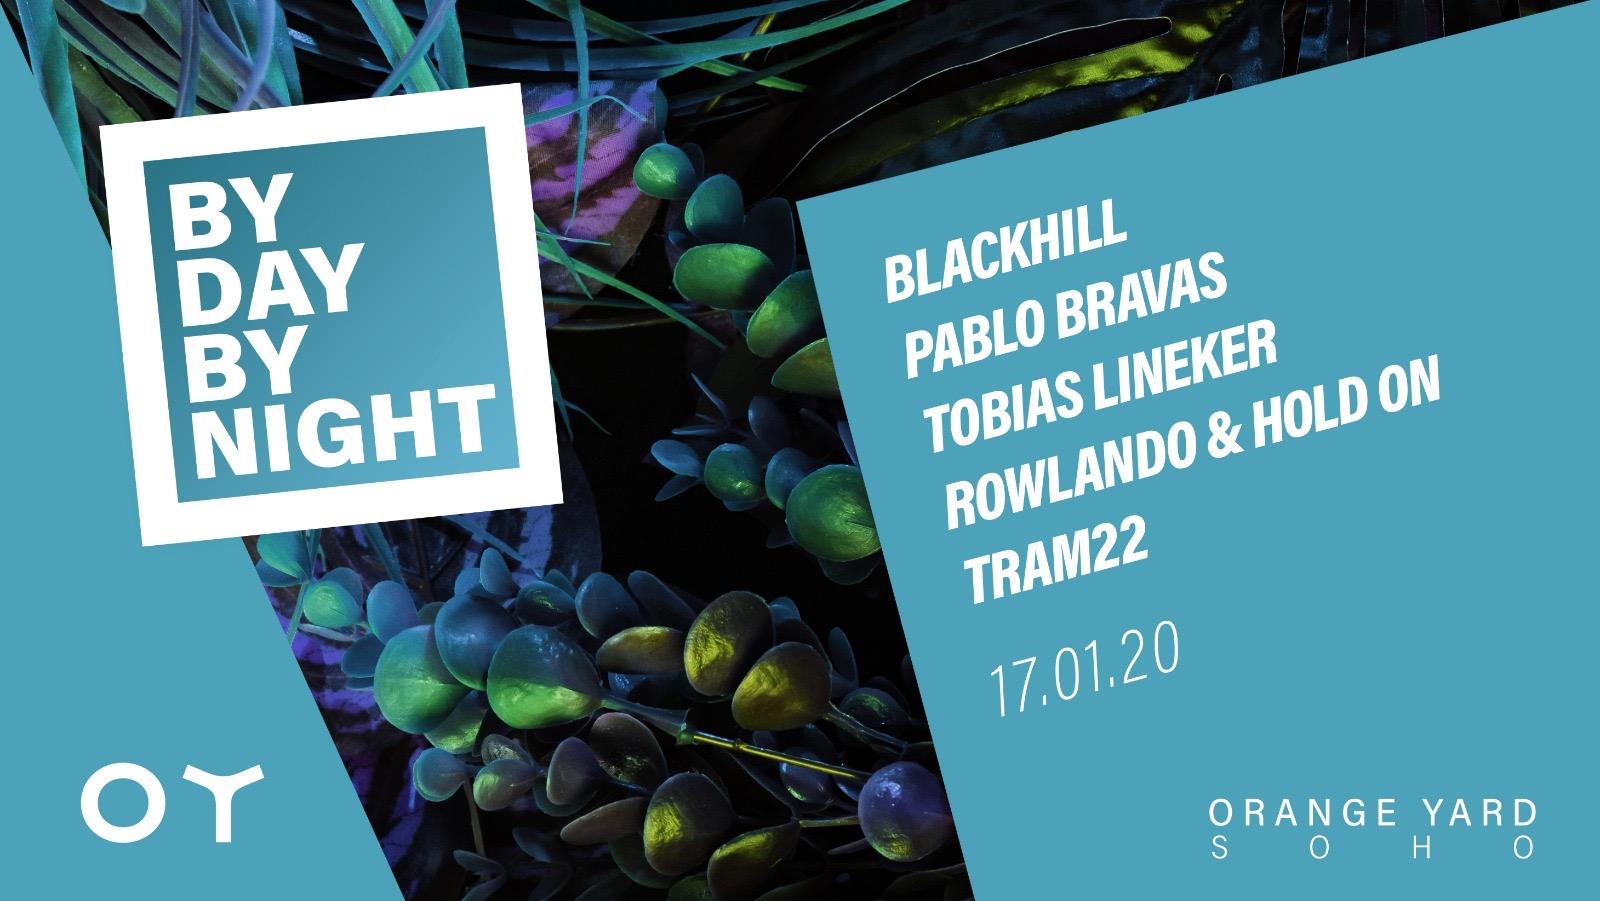 Byday Bynight 2020 opening party: Orange Yard Soho